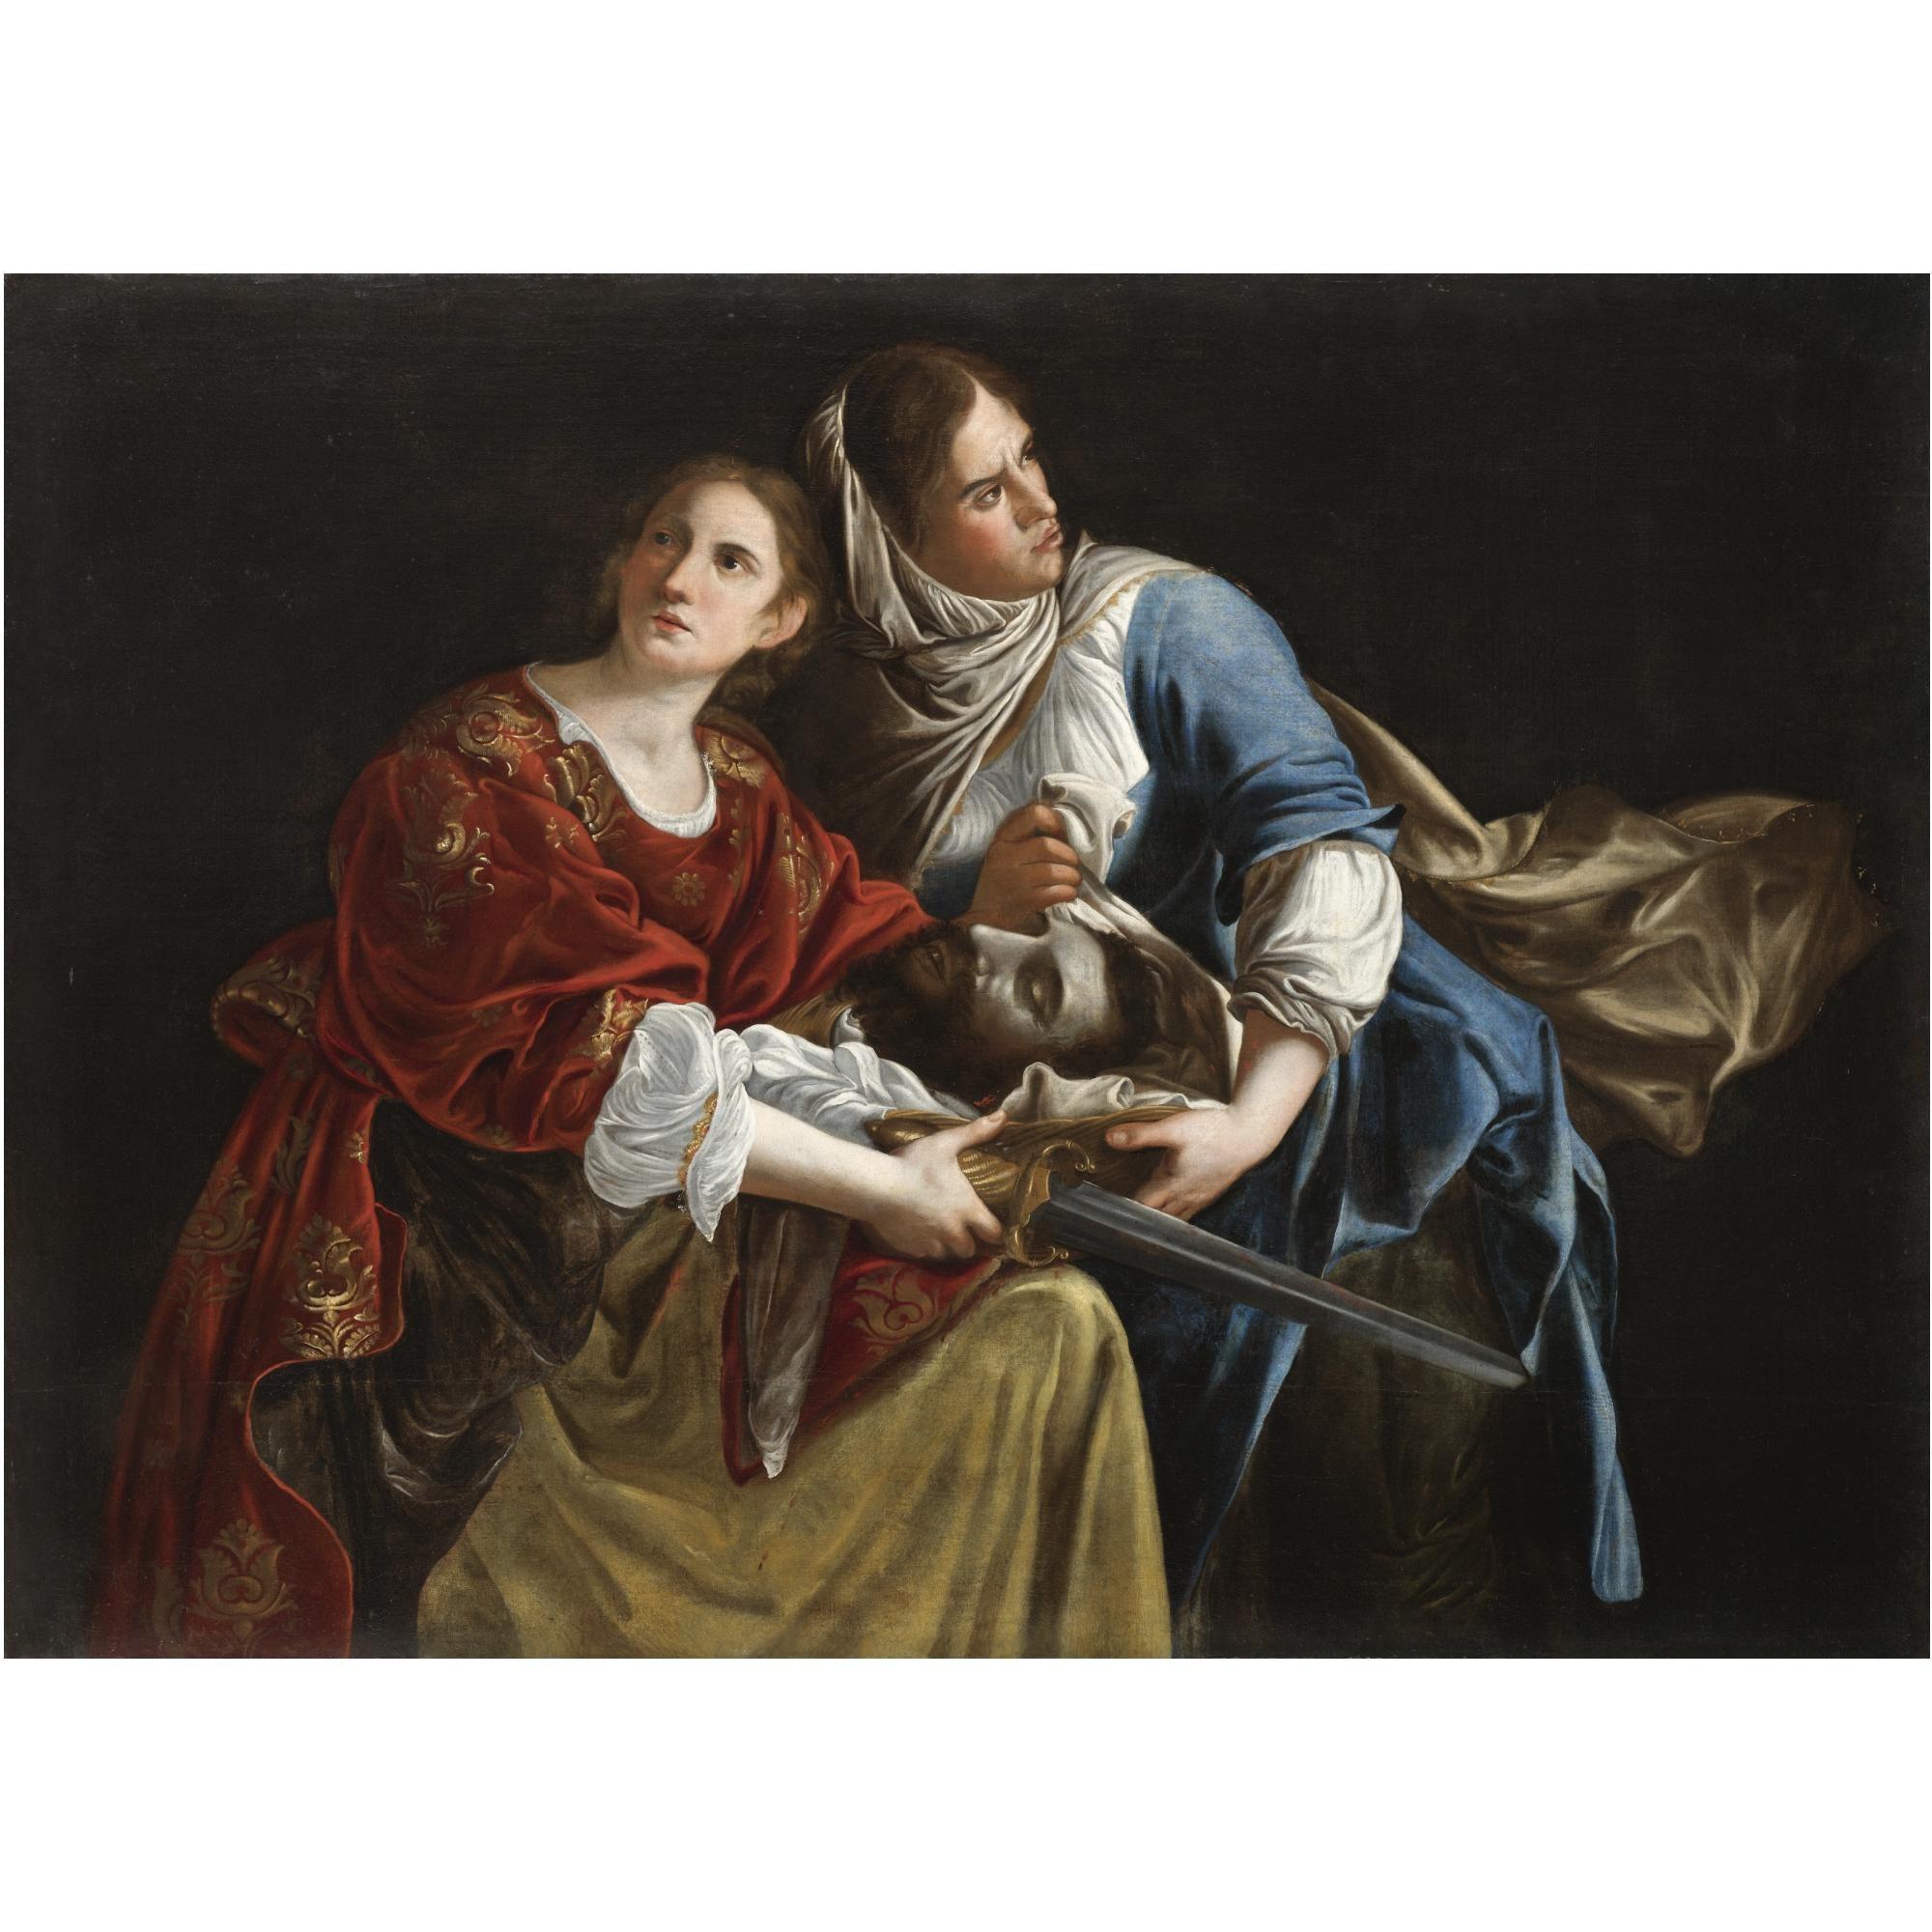 Gentileschi  Judith and her maidservant with the head of Holofernes    Judith And Her Maidservant With The Head Of Holofernes